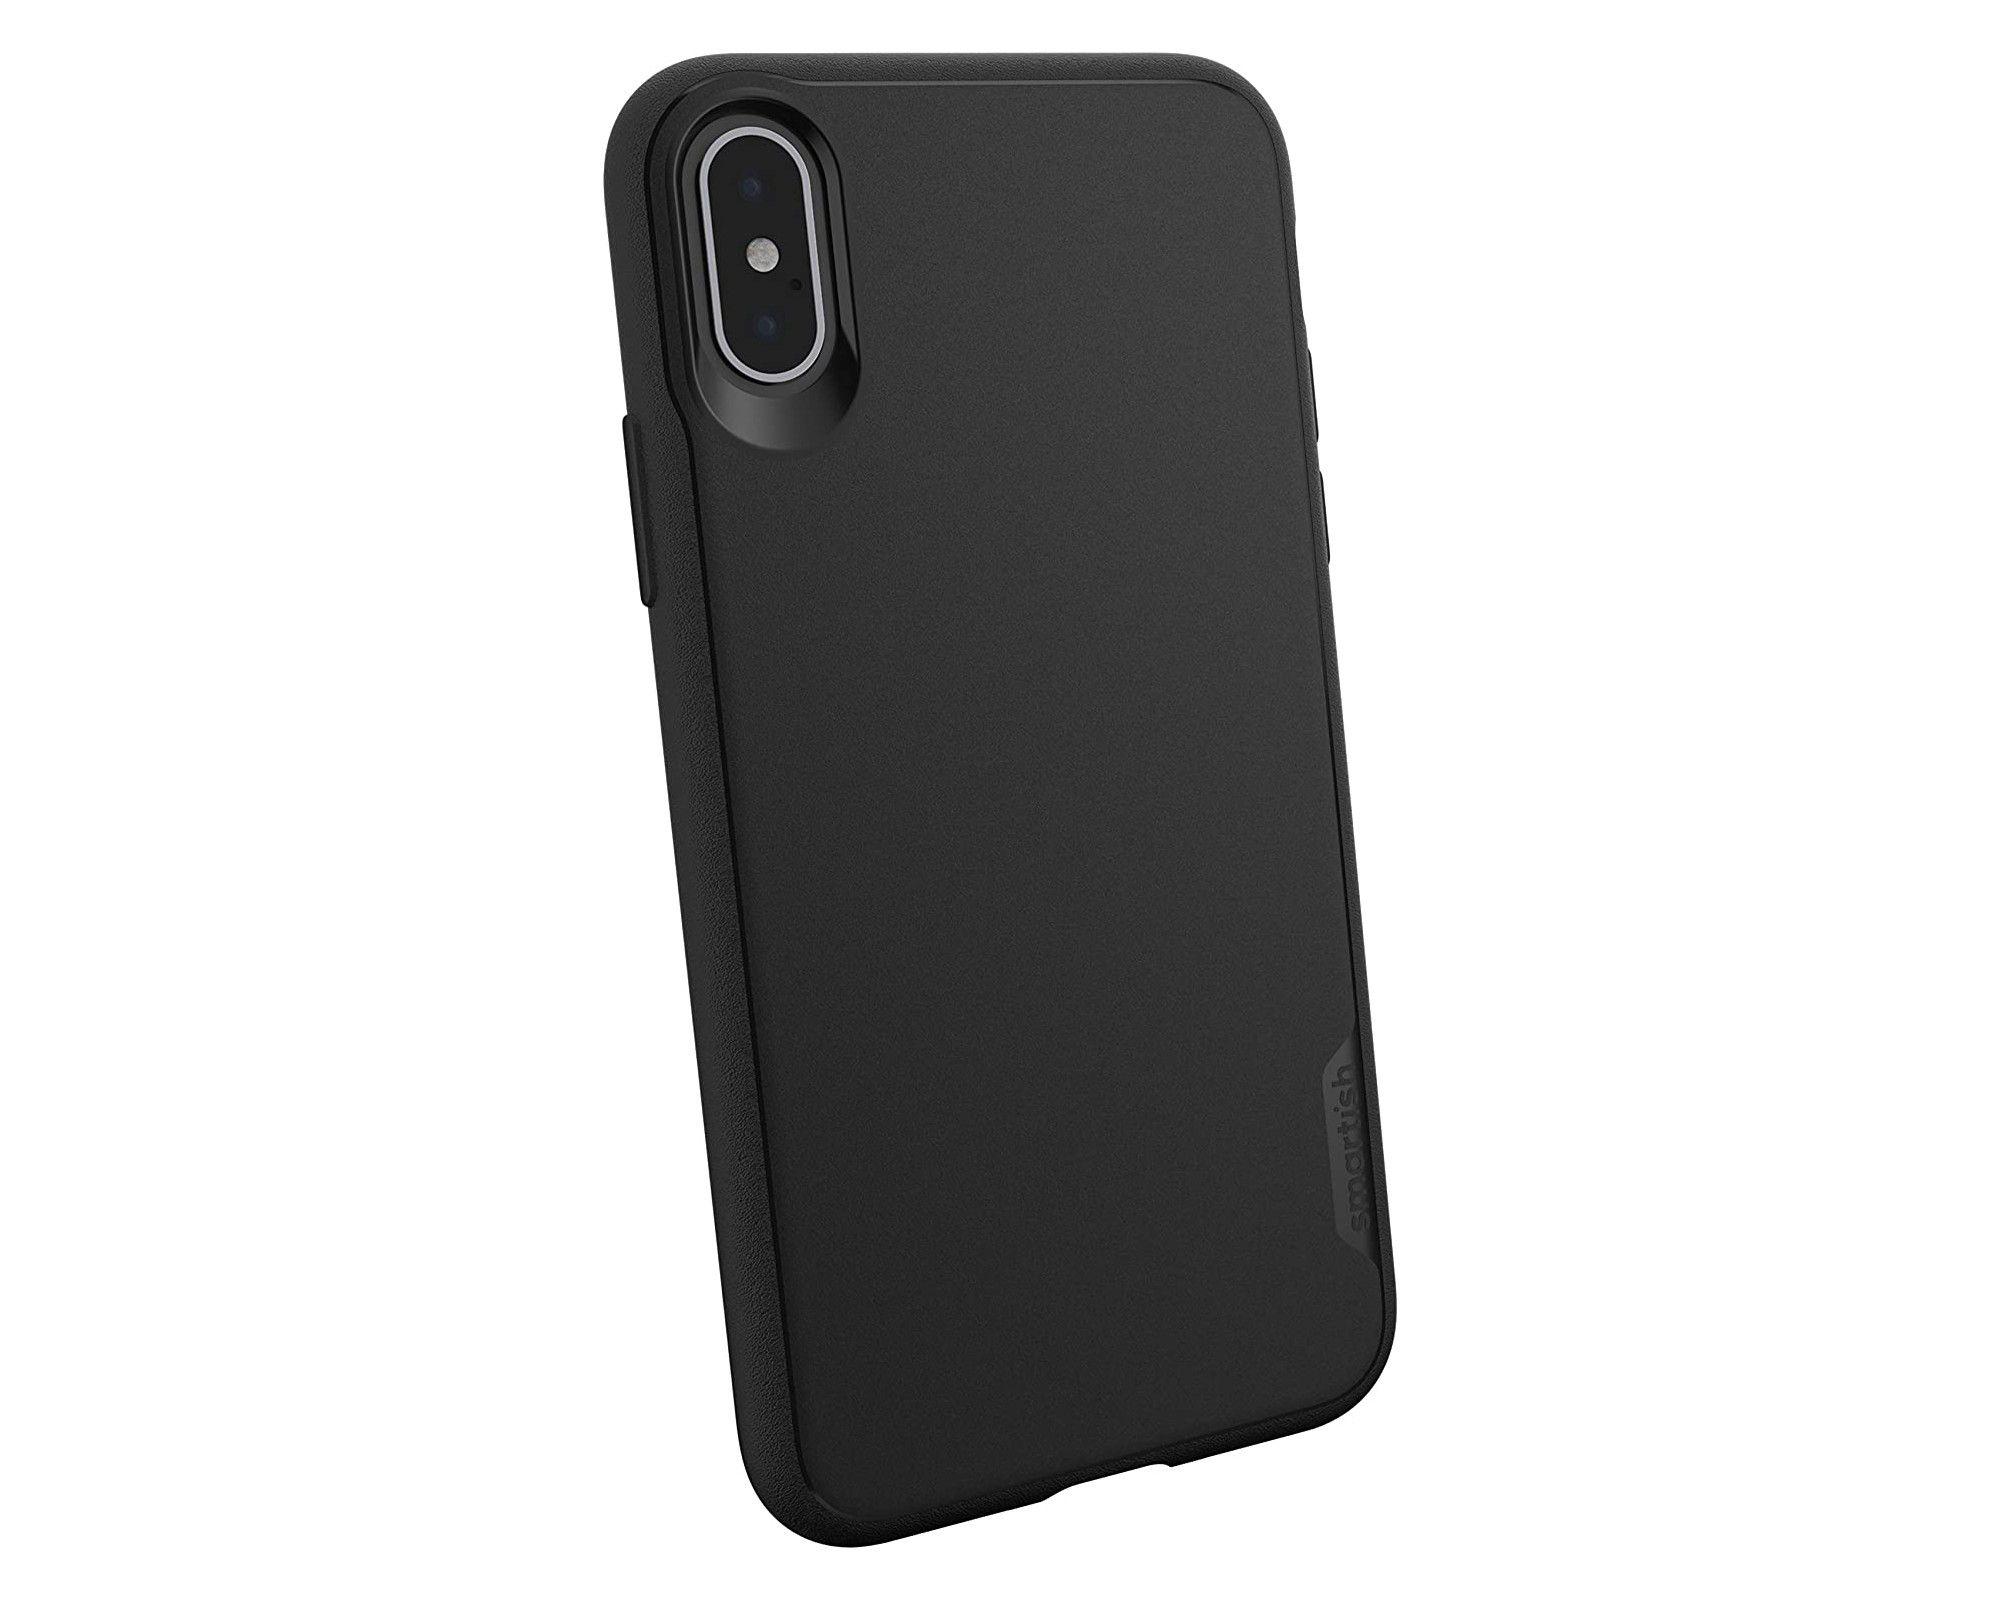 Silk iPhone X Grip Case